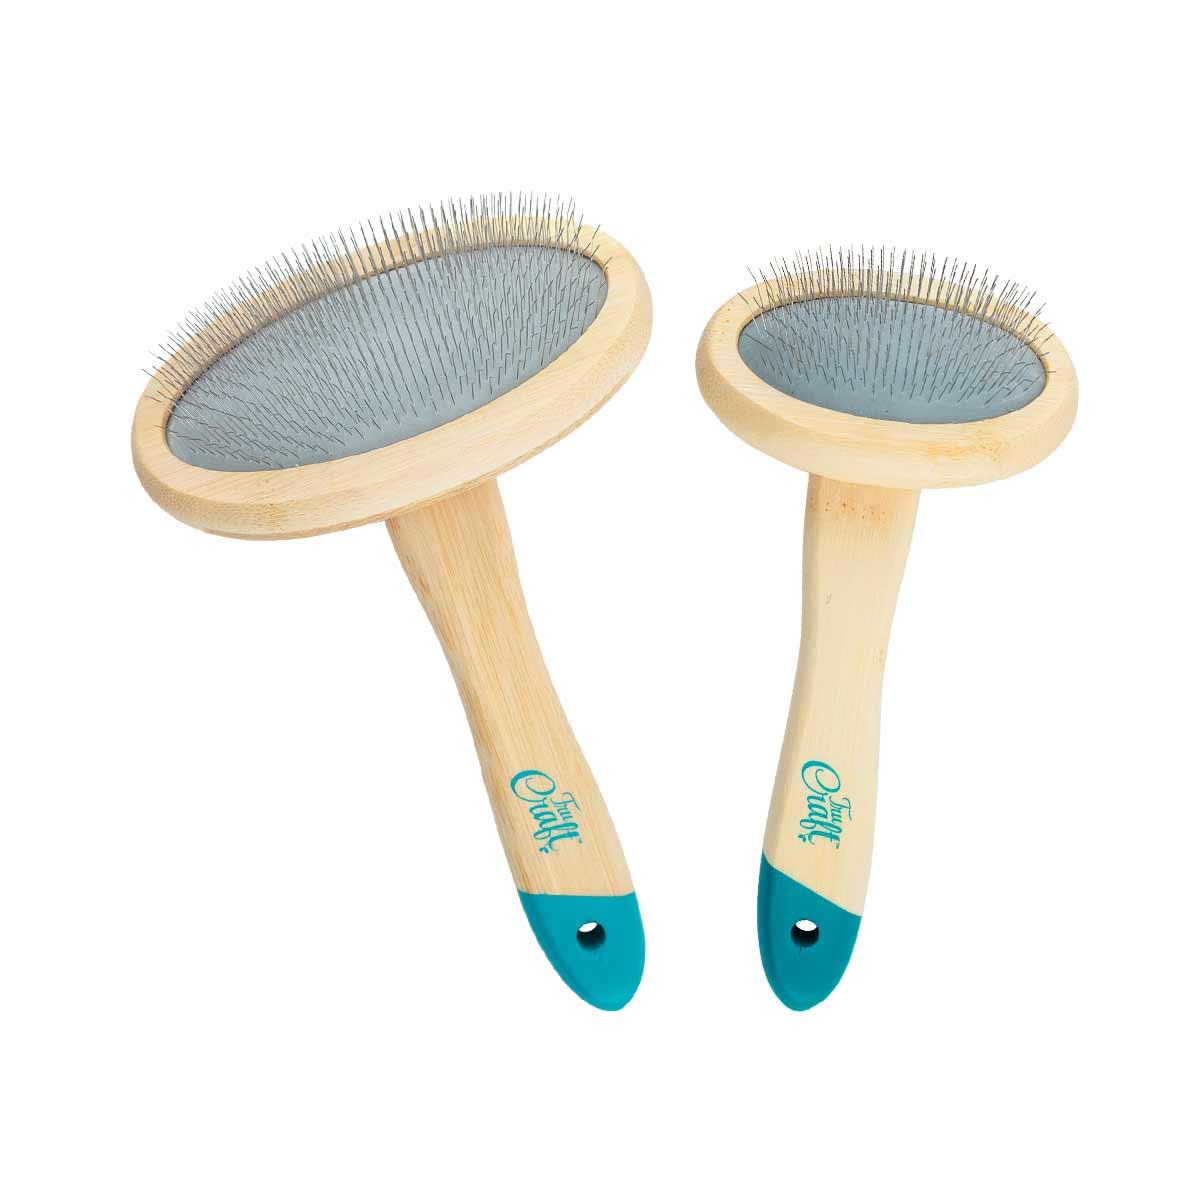 Tru Craft™ Bamboo Slicker Brush Small and Large